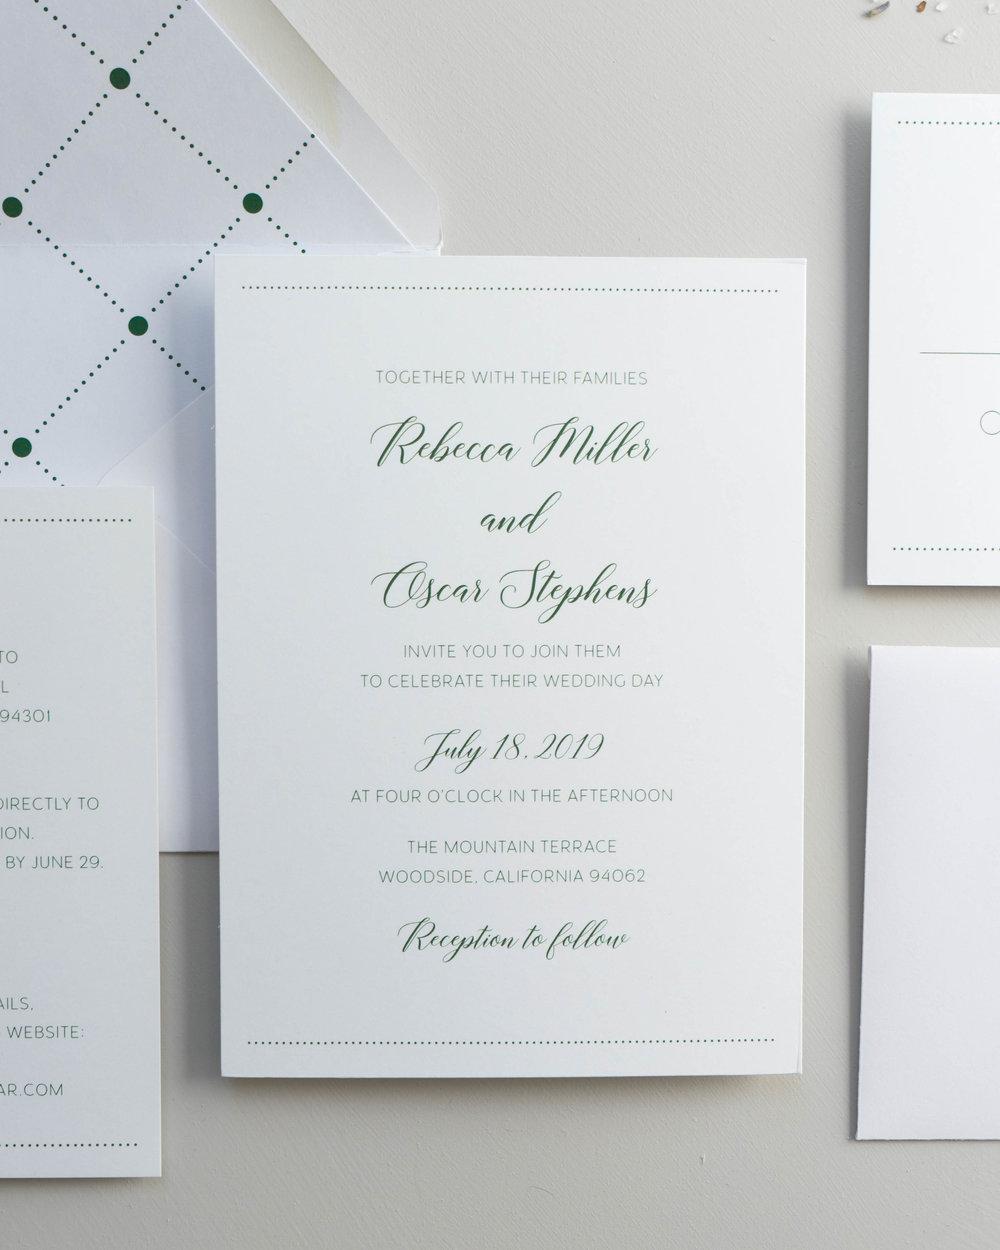 Simple Green Wedding Invitation by Just Jurf-01342.jpg